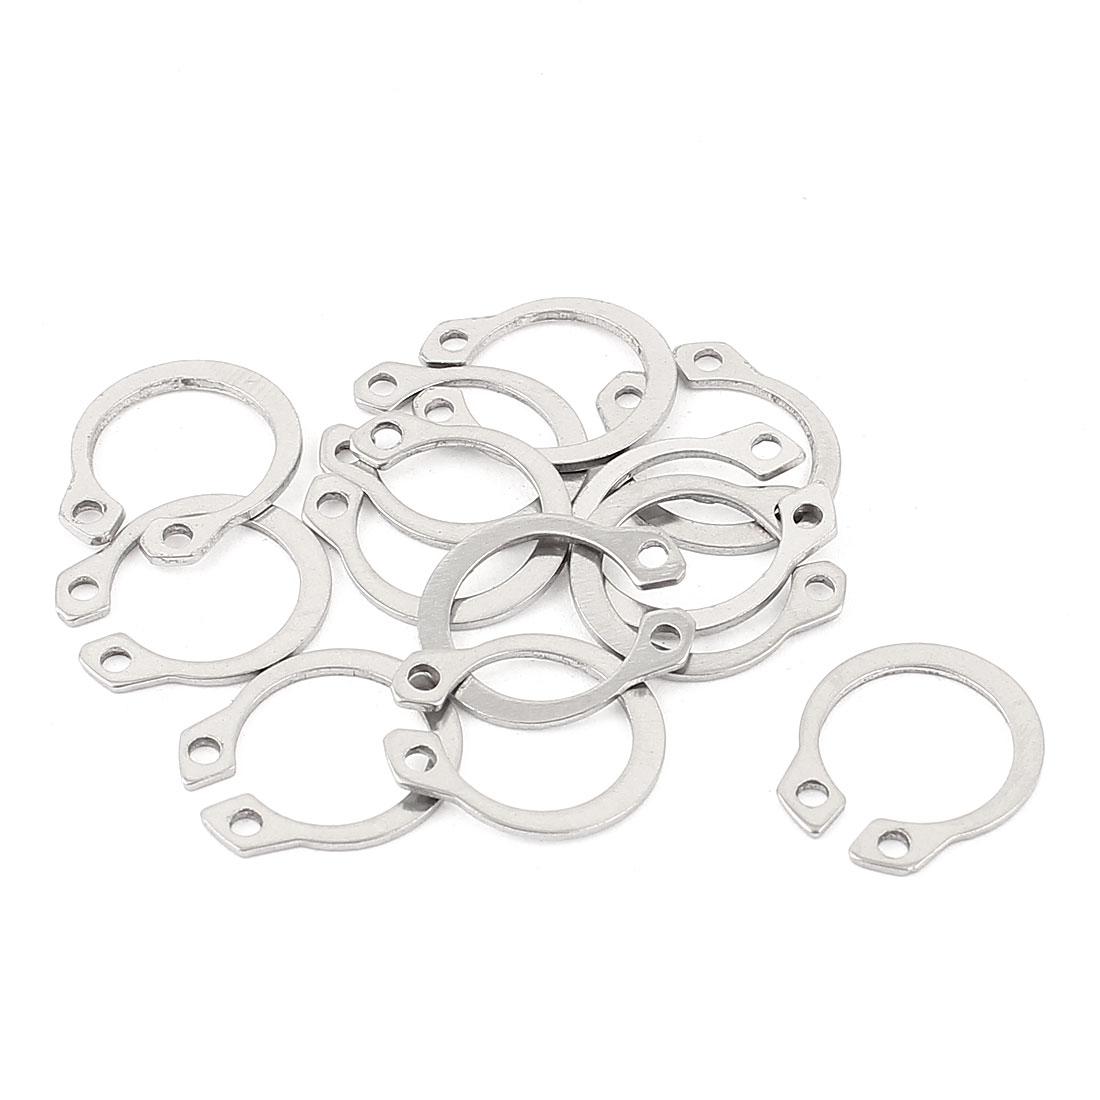 10pcs 304 Stainless Steel External Circlip Retaining Shaft Snap Rings 13mm